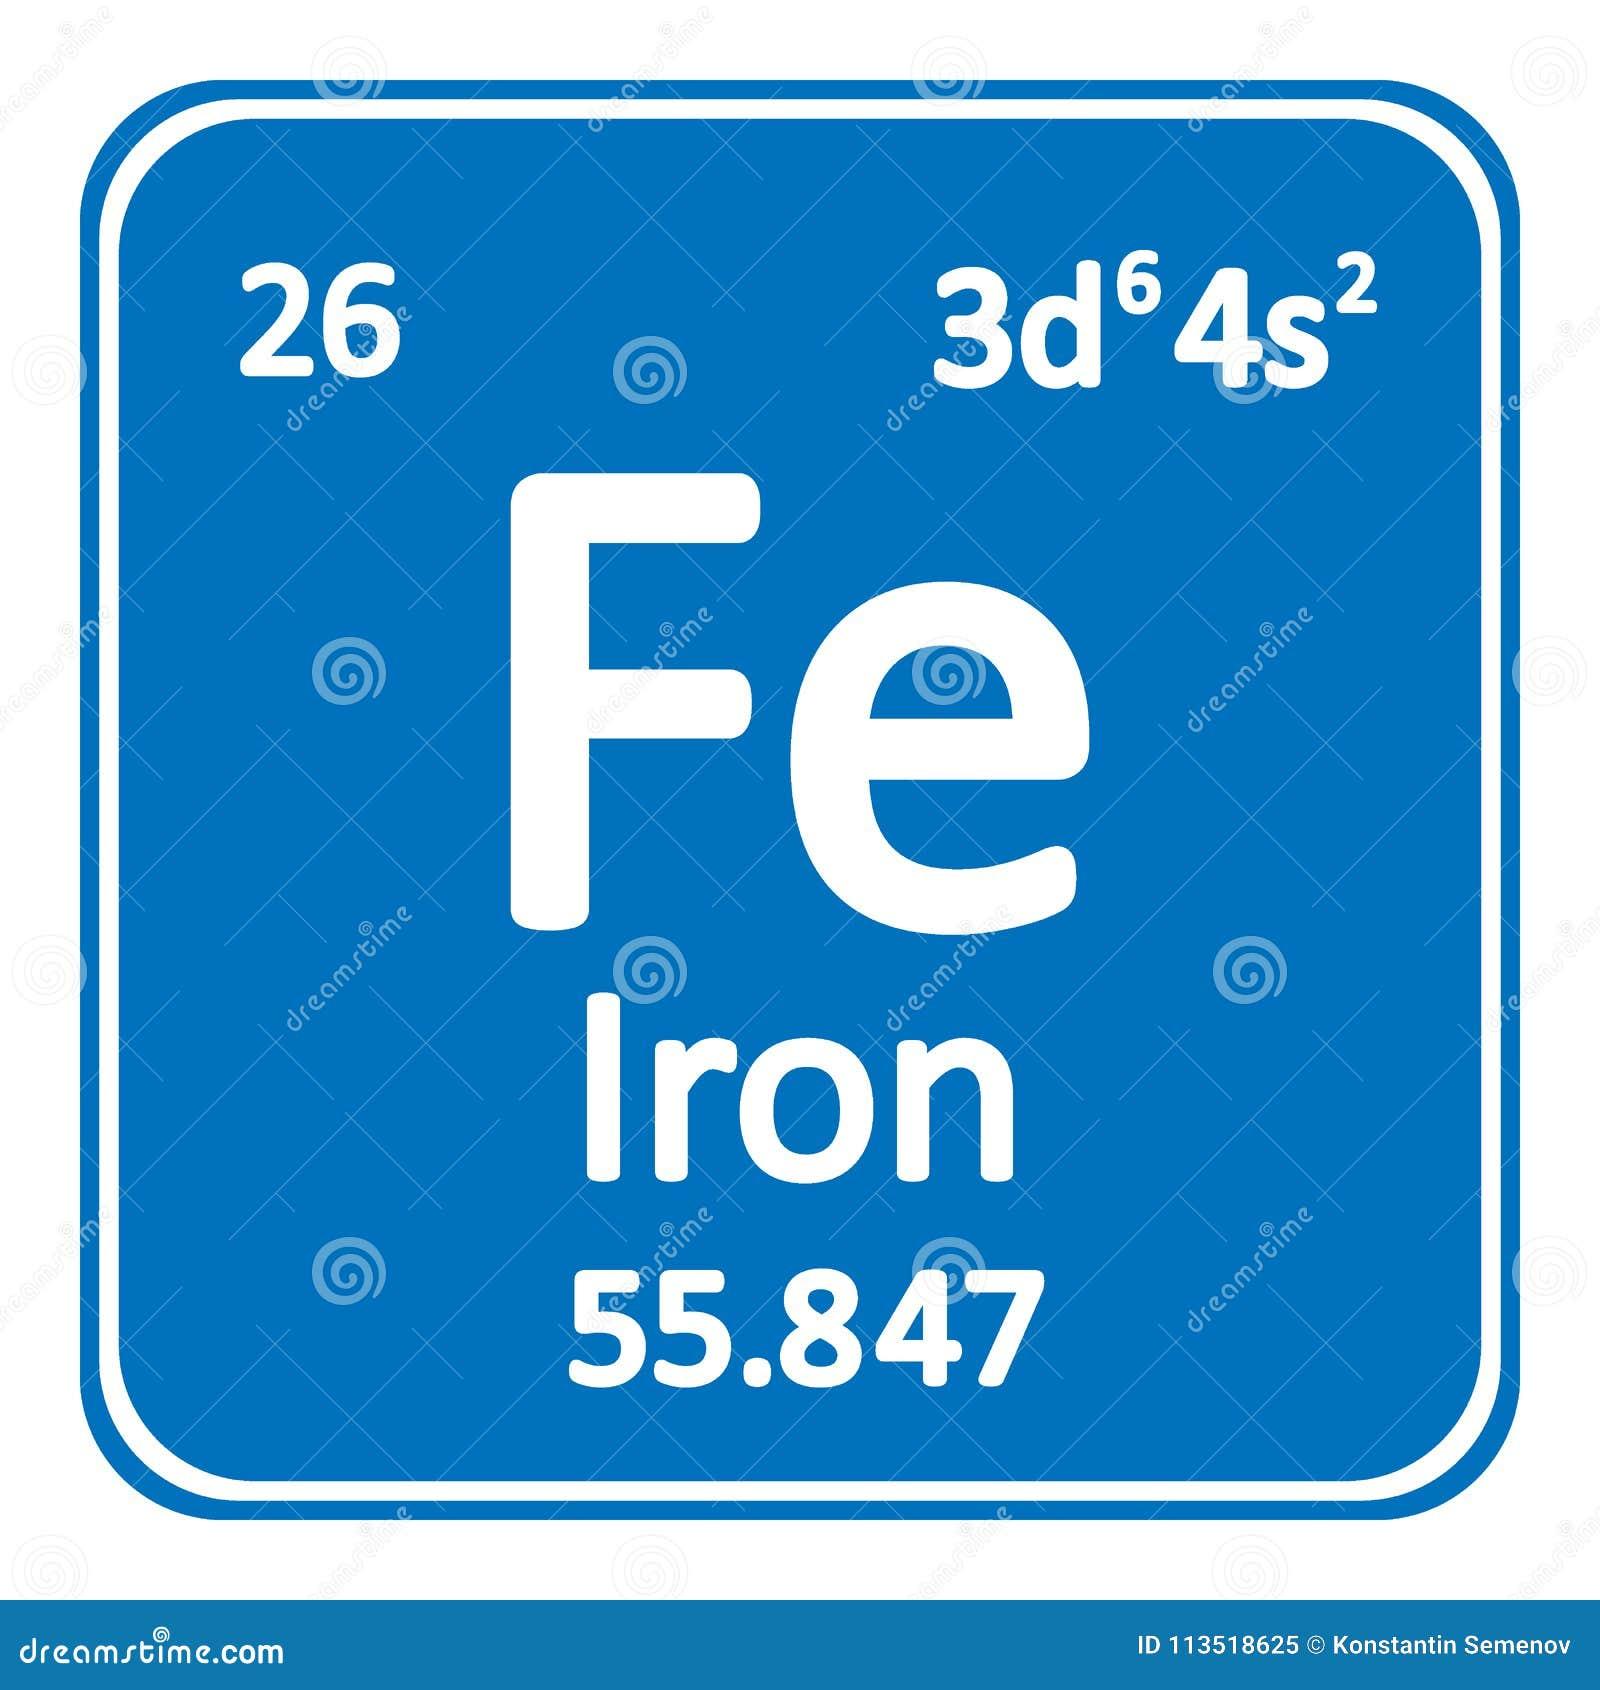 Periodic Table Element Iron Icon Stock Illustration Illustration